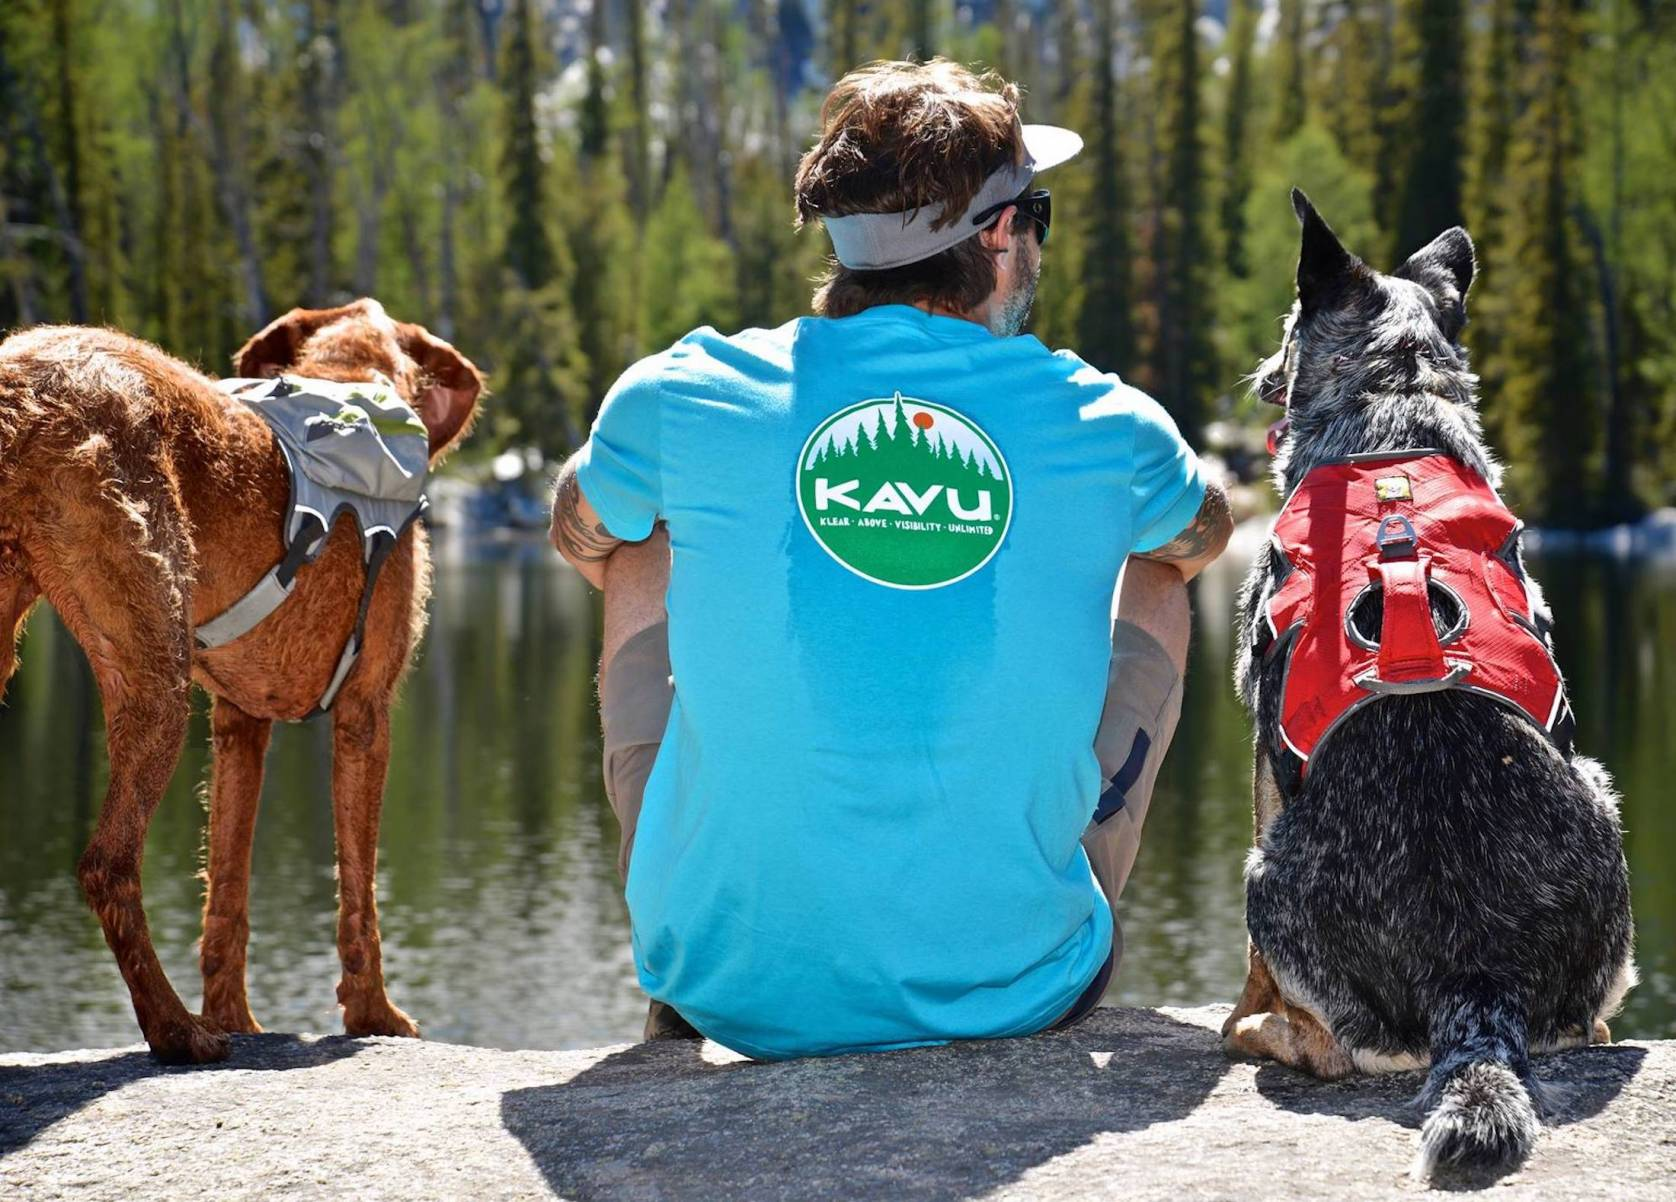 KAVU brand with dogs